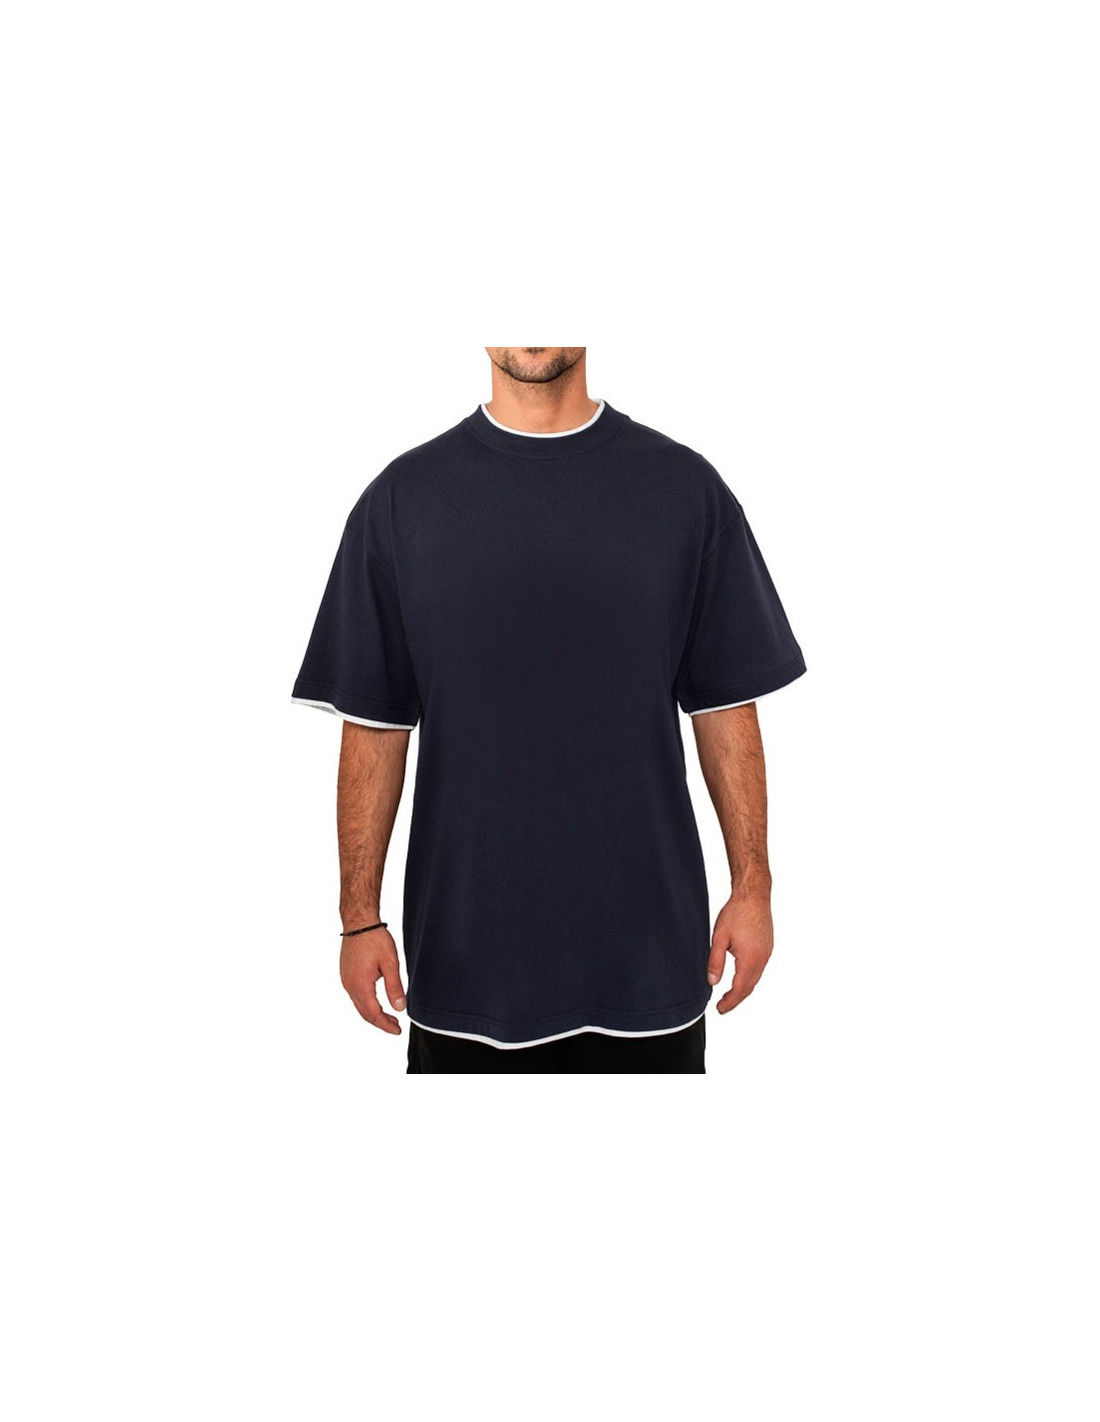 Urban 2-tone t-shirt navy / white